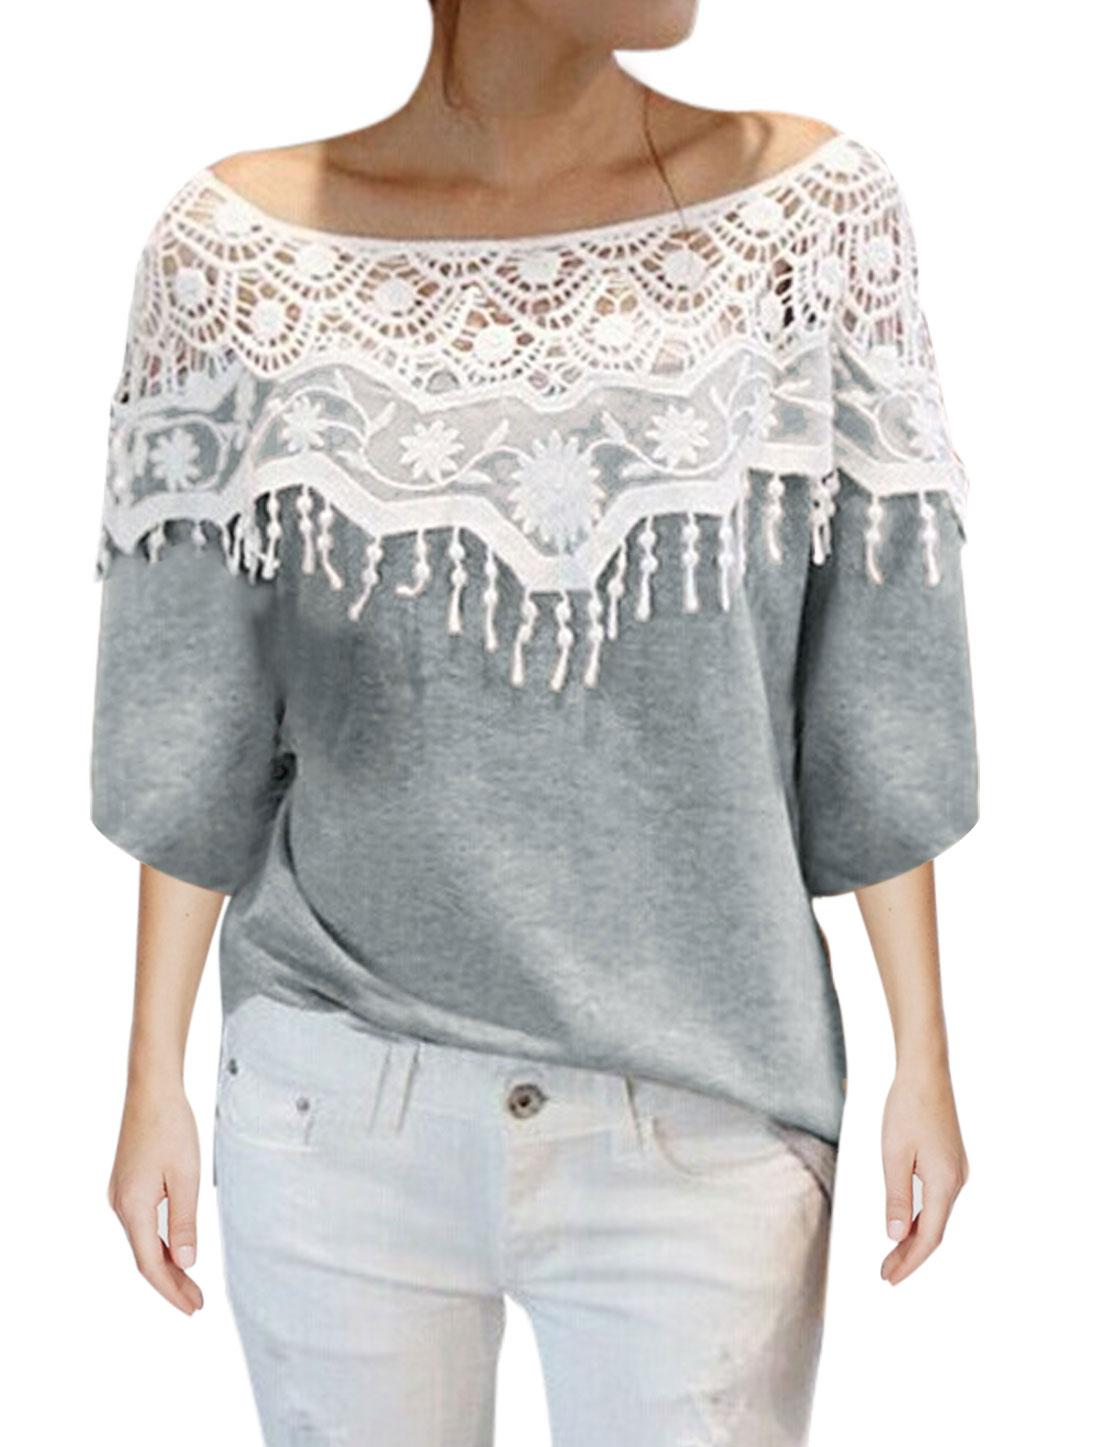 Lady Half Raglan Sleeve Lace York Tassel Design Tunic Top Light Gray XS